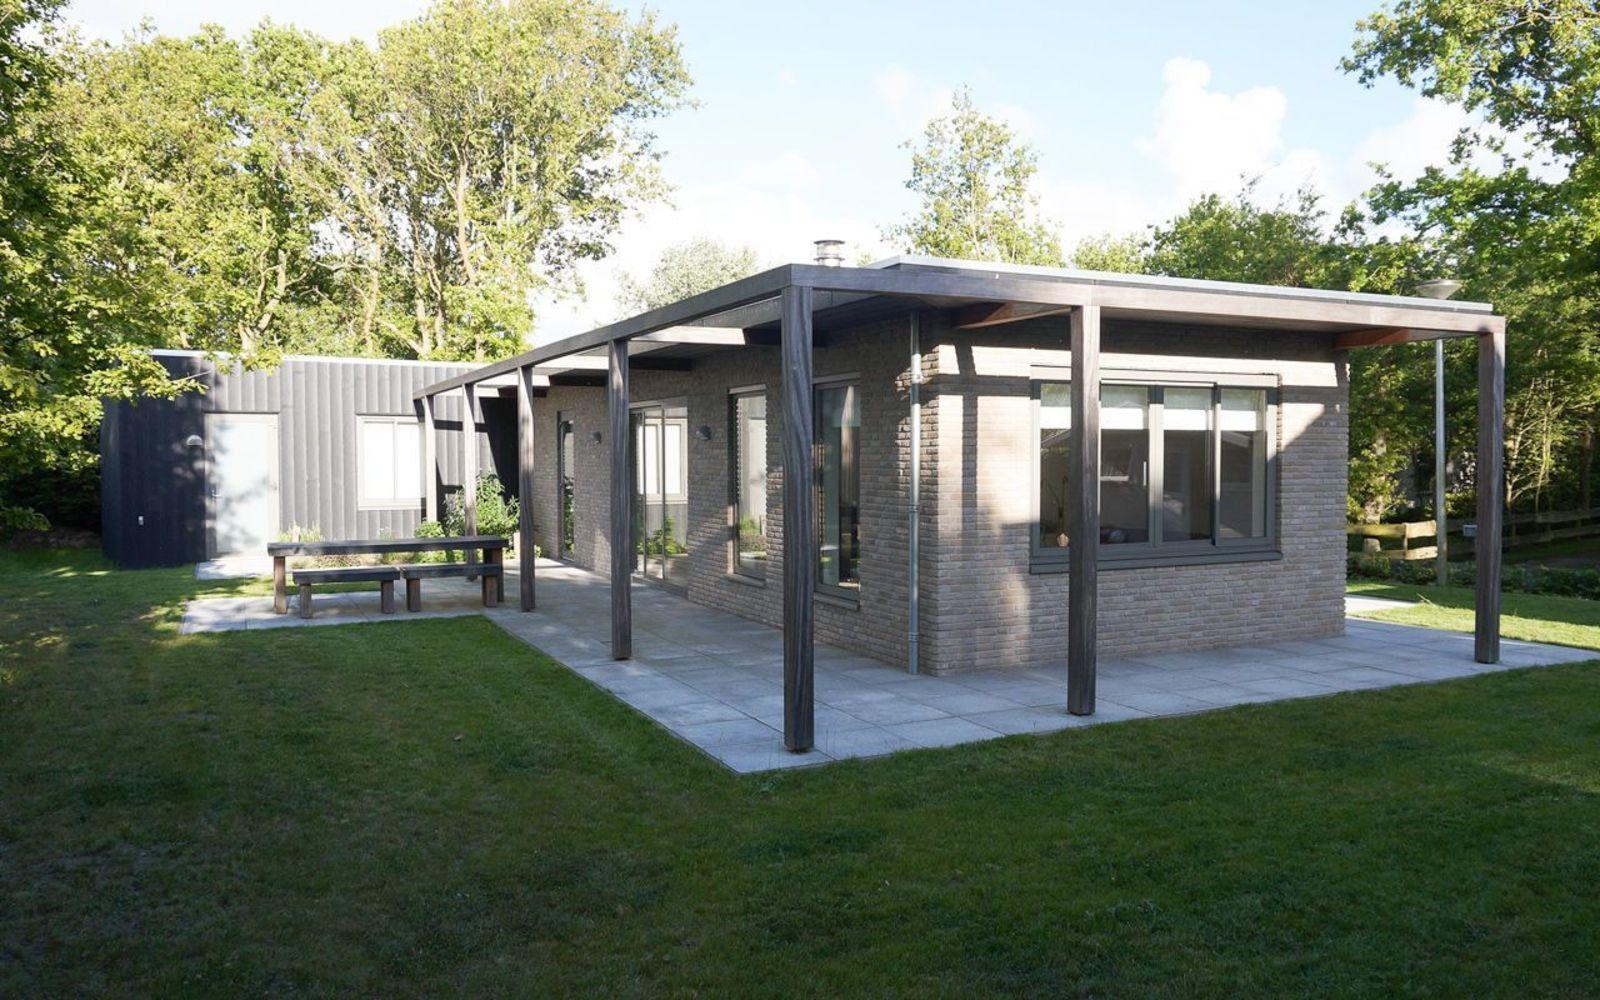 Jonkerstee 34 - Ouddorp